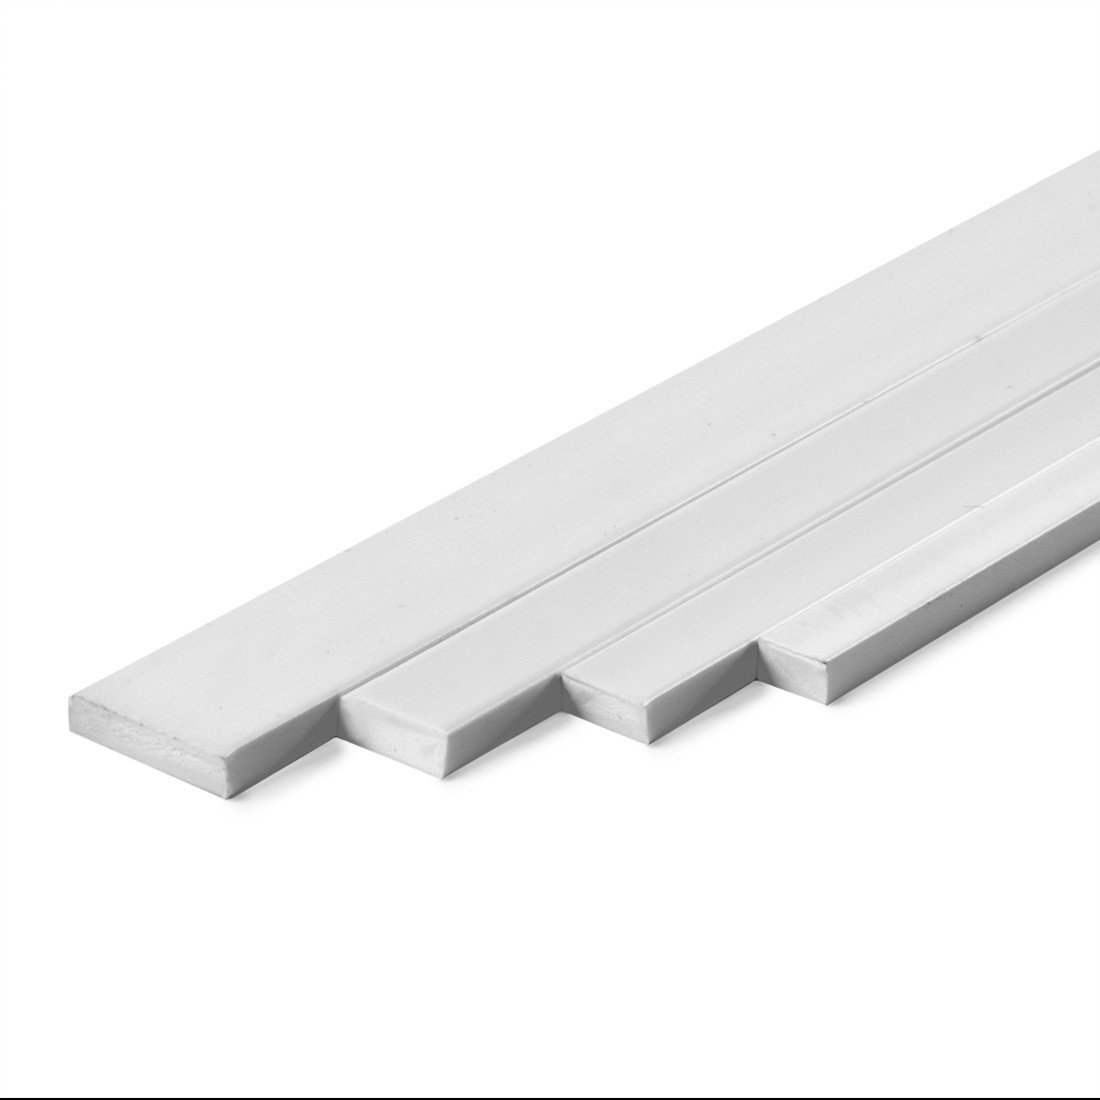 Profile ASA rectangulaire mm.2x3x1000